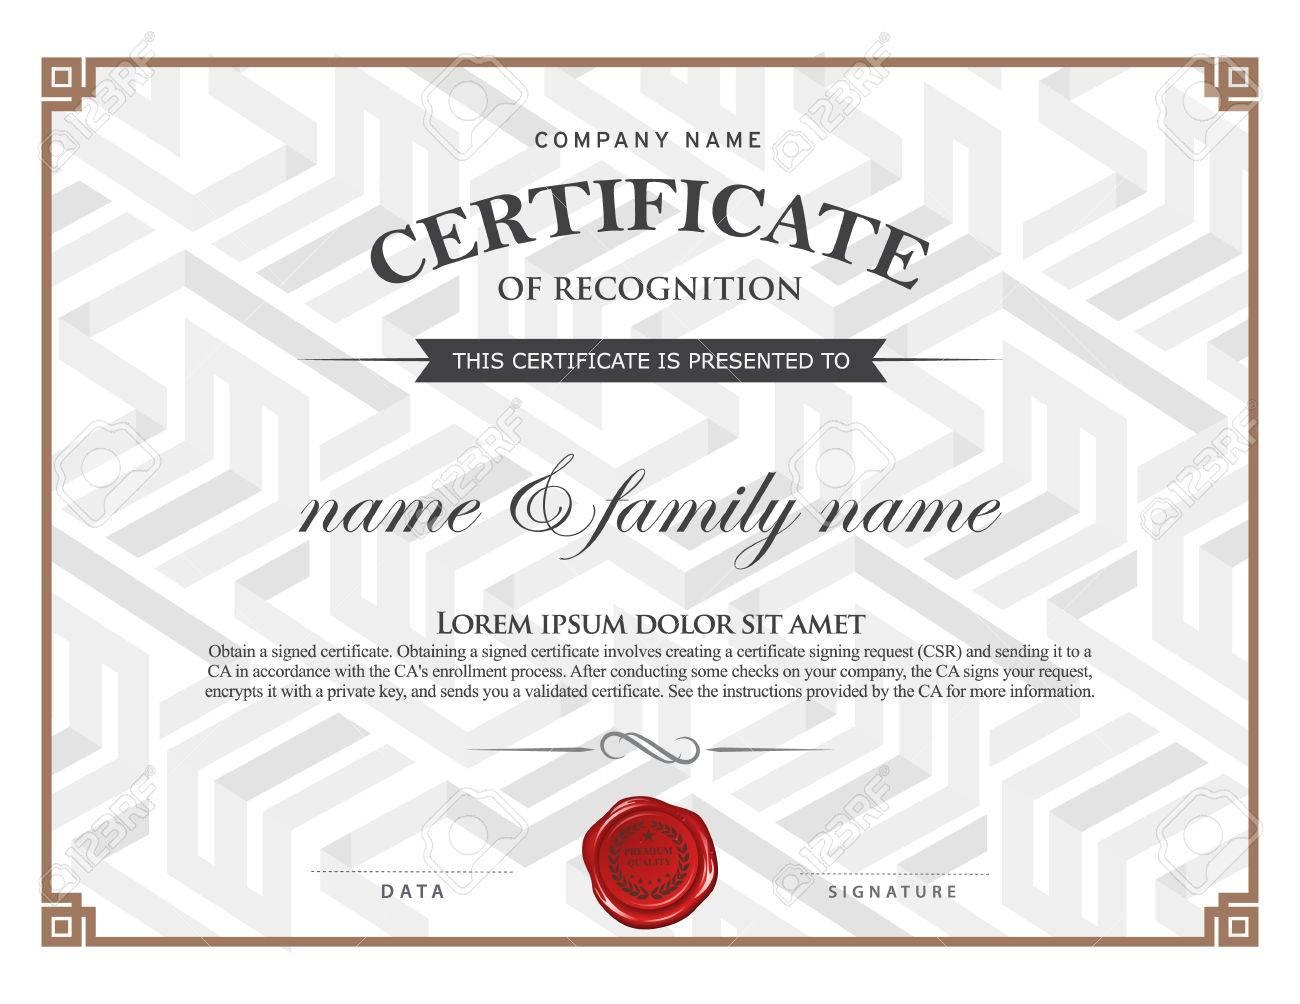 Certificate template certificate template can be rectangular certificate template certificate template can be rectangular white superimposed on the original text yadclub Choice Image